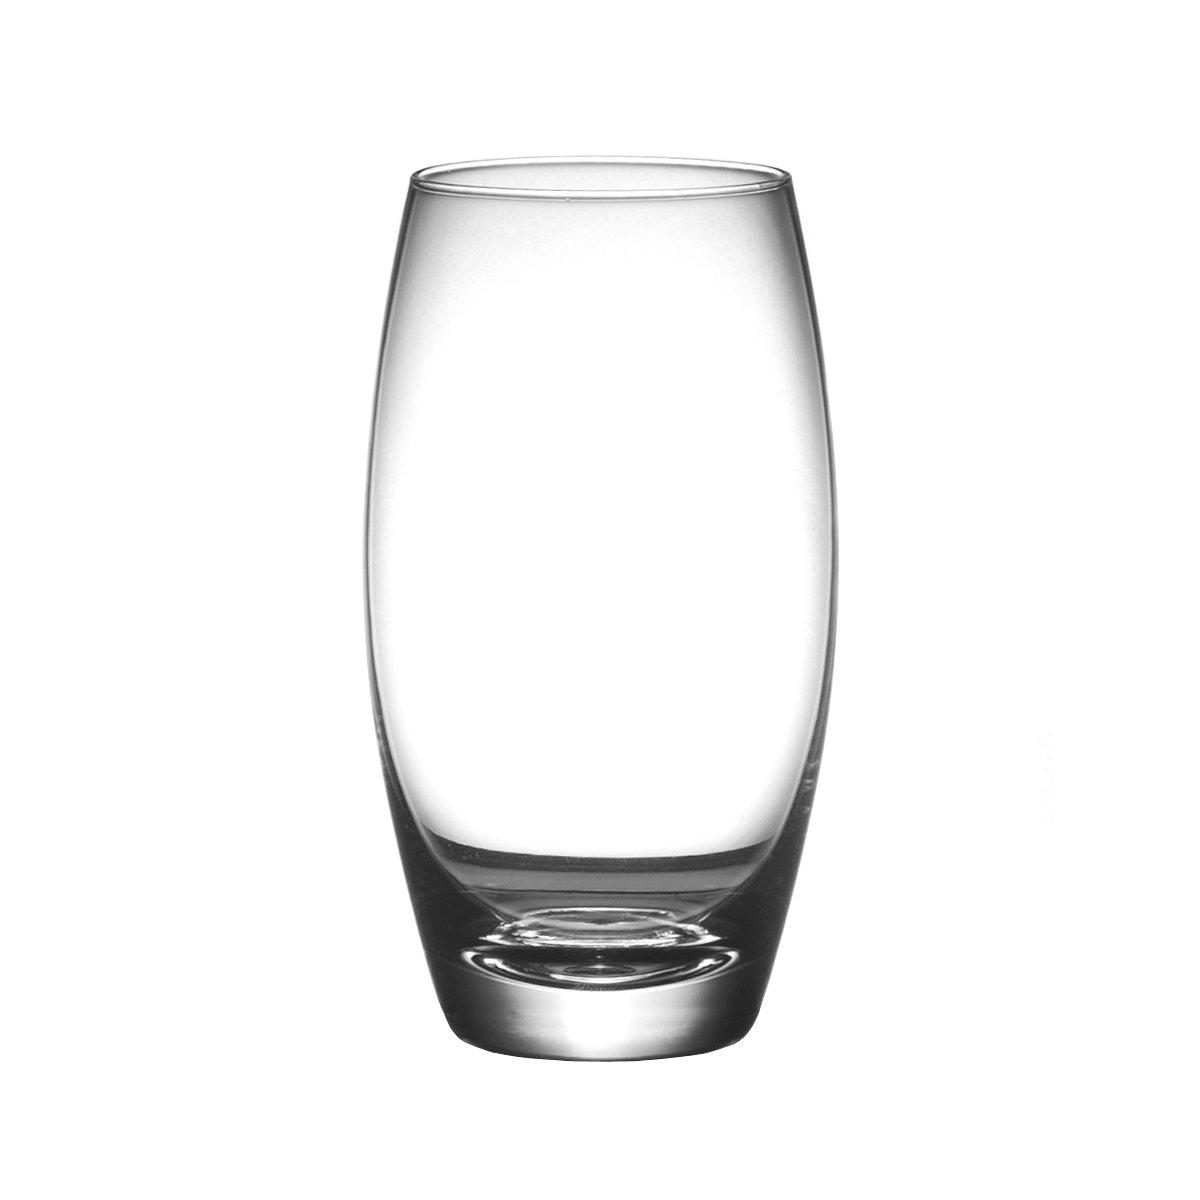 circle 透明玻璃杯 高口杯 水杯 杯子605ml